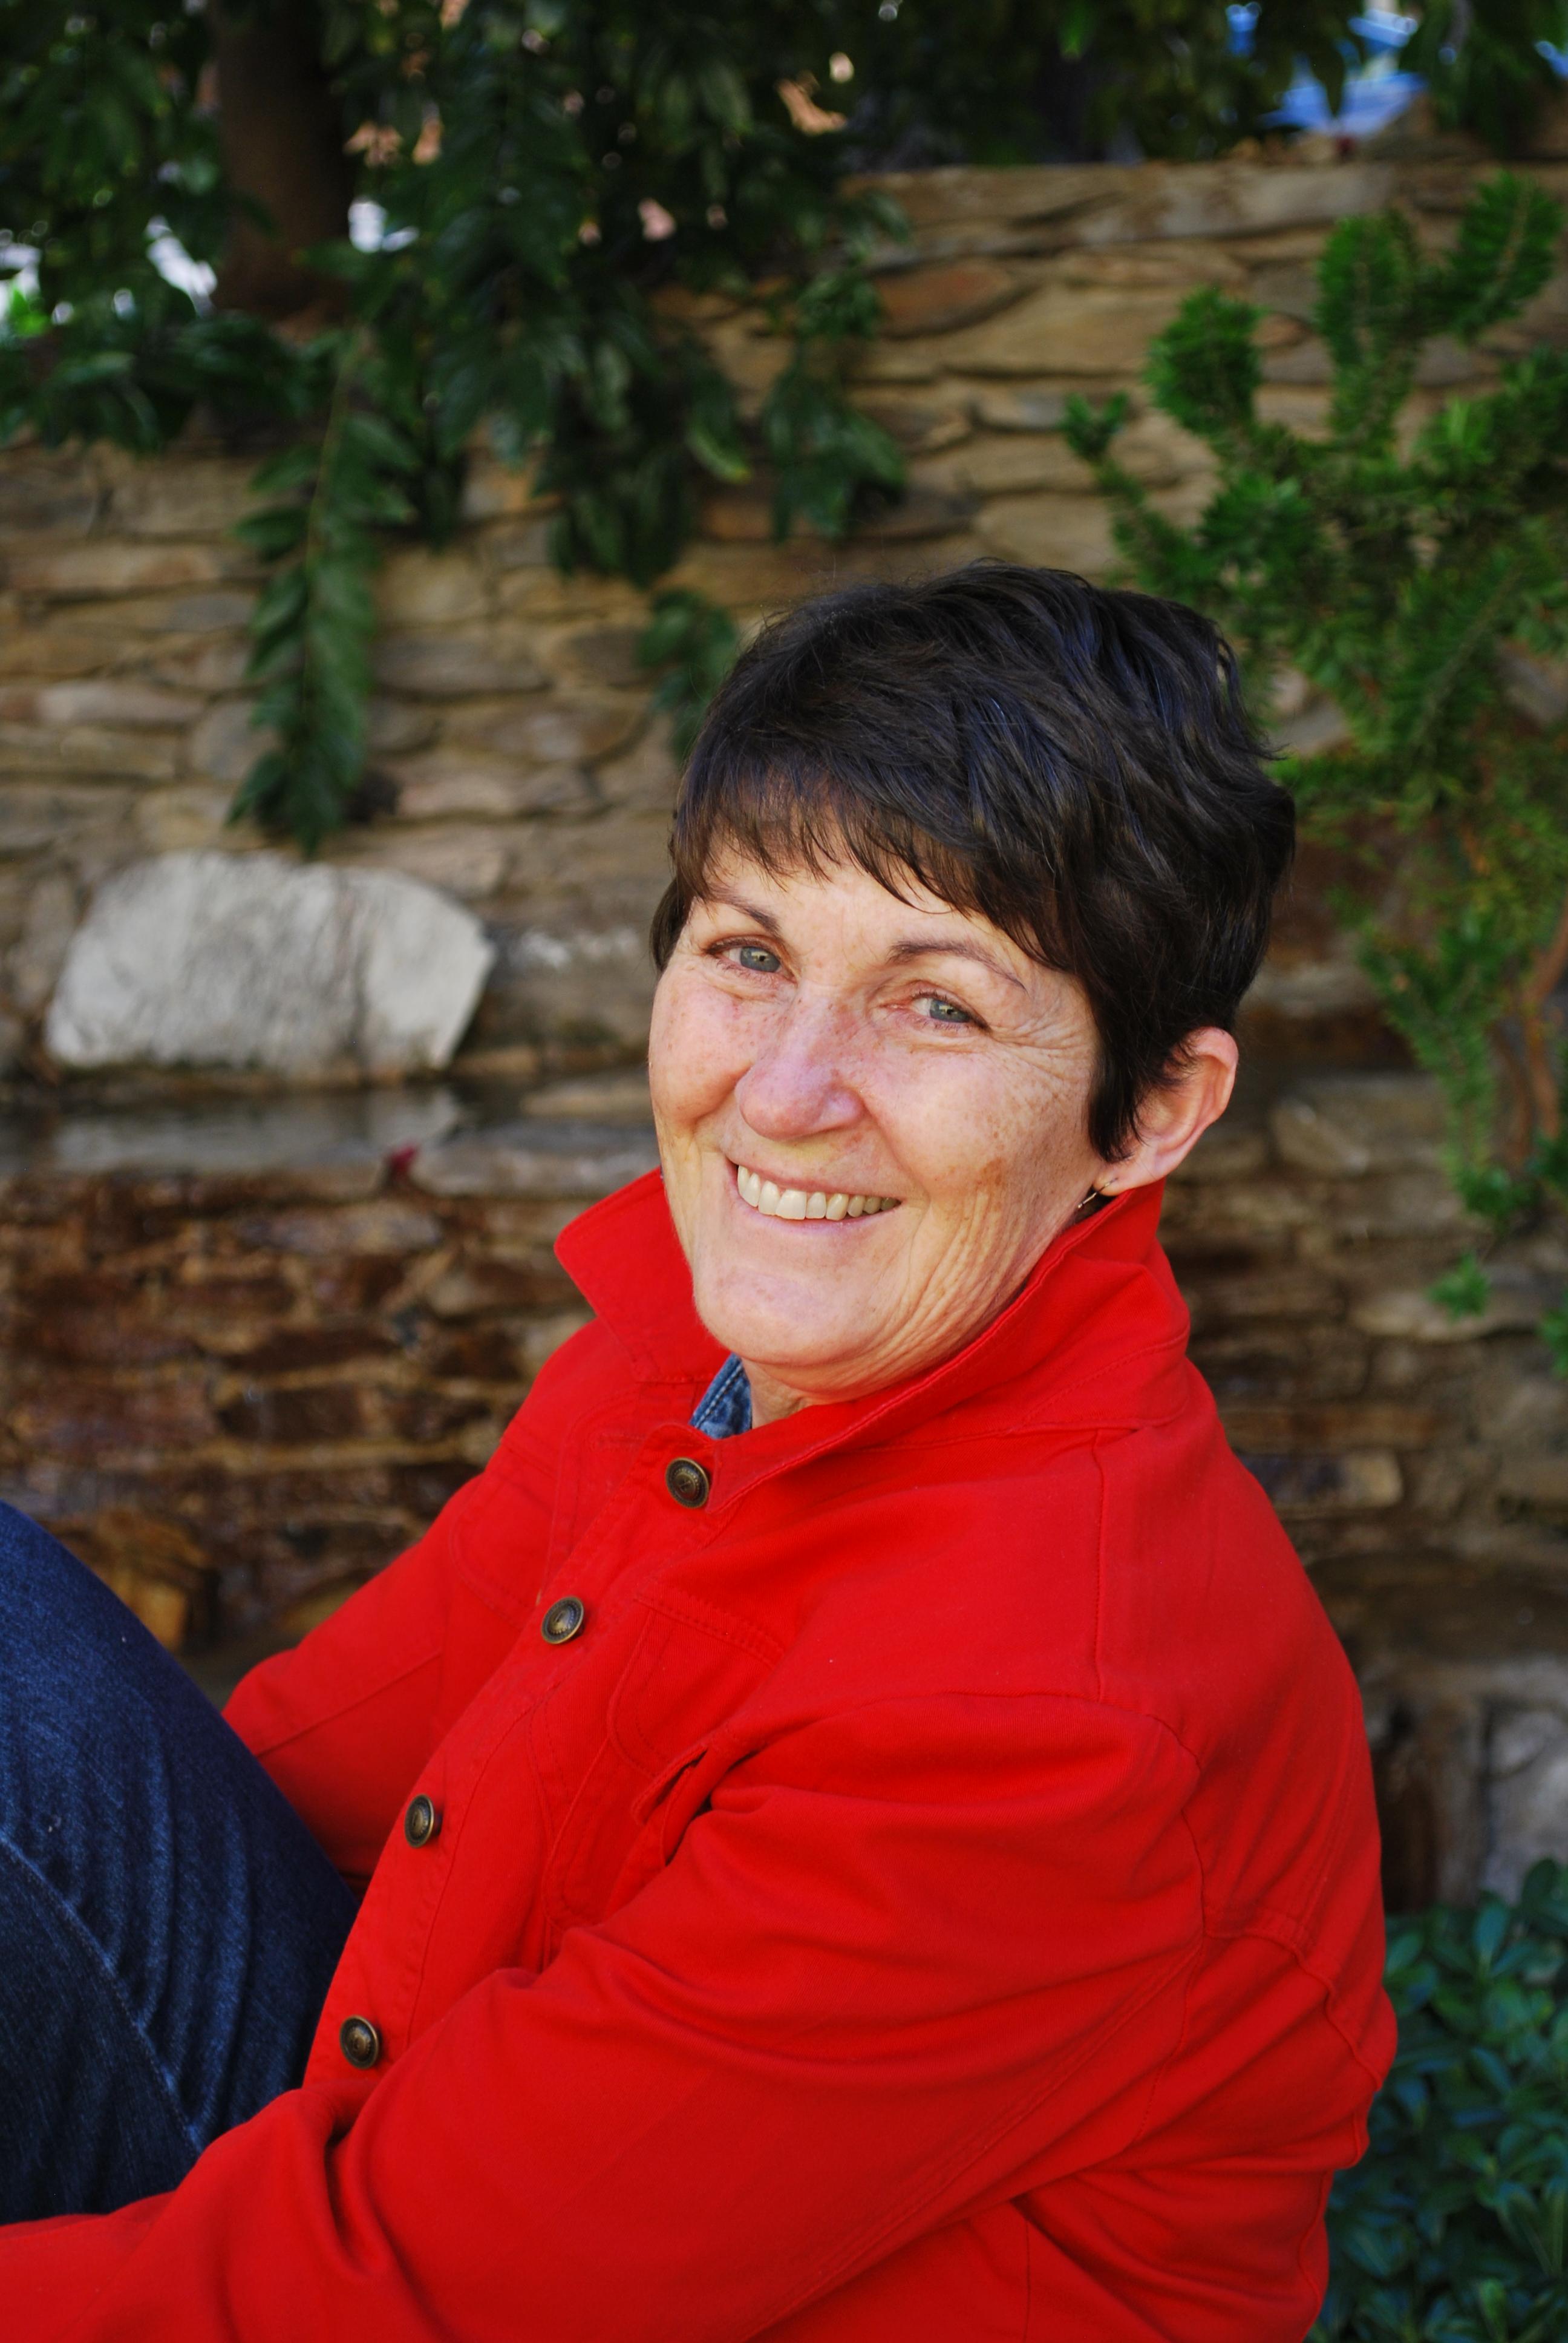 Pamela Kleibrink Thompson, trener kreatywności, nawigator kariery, rekruter 911